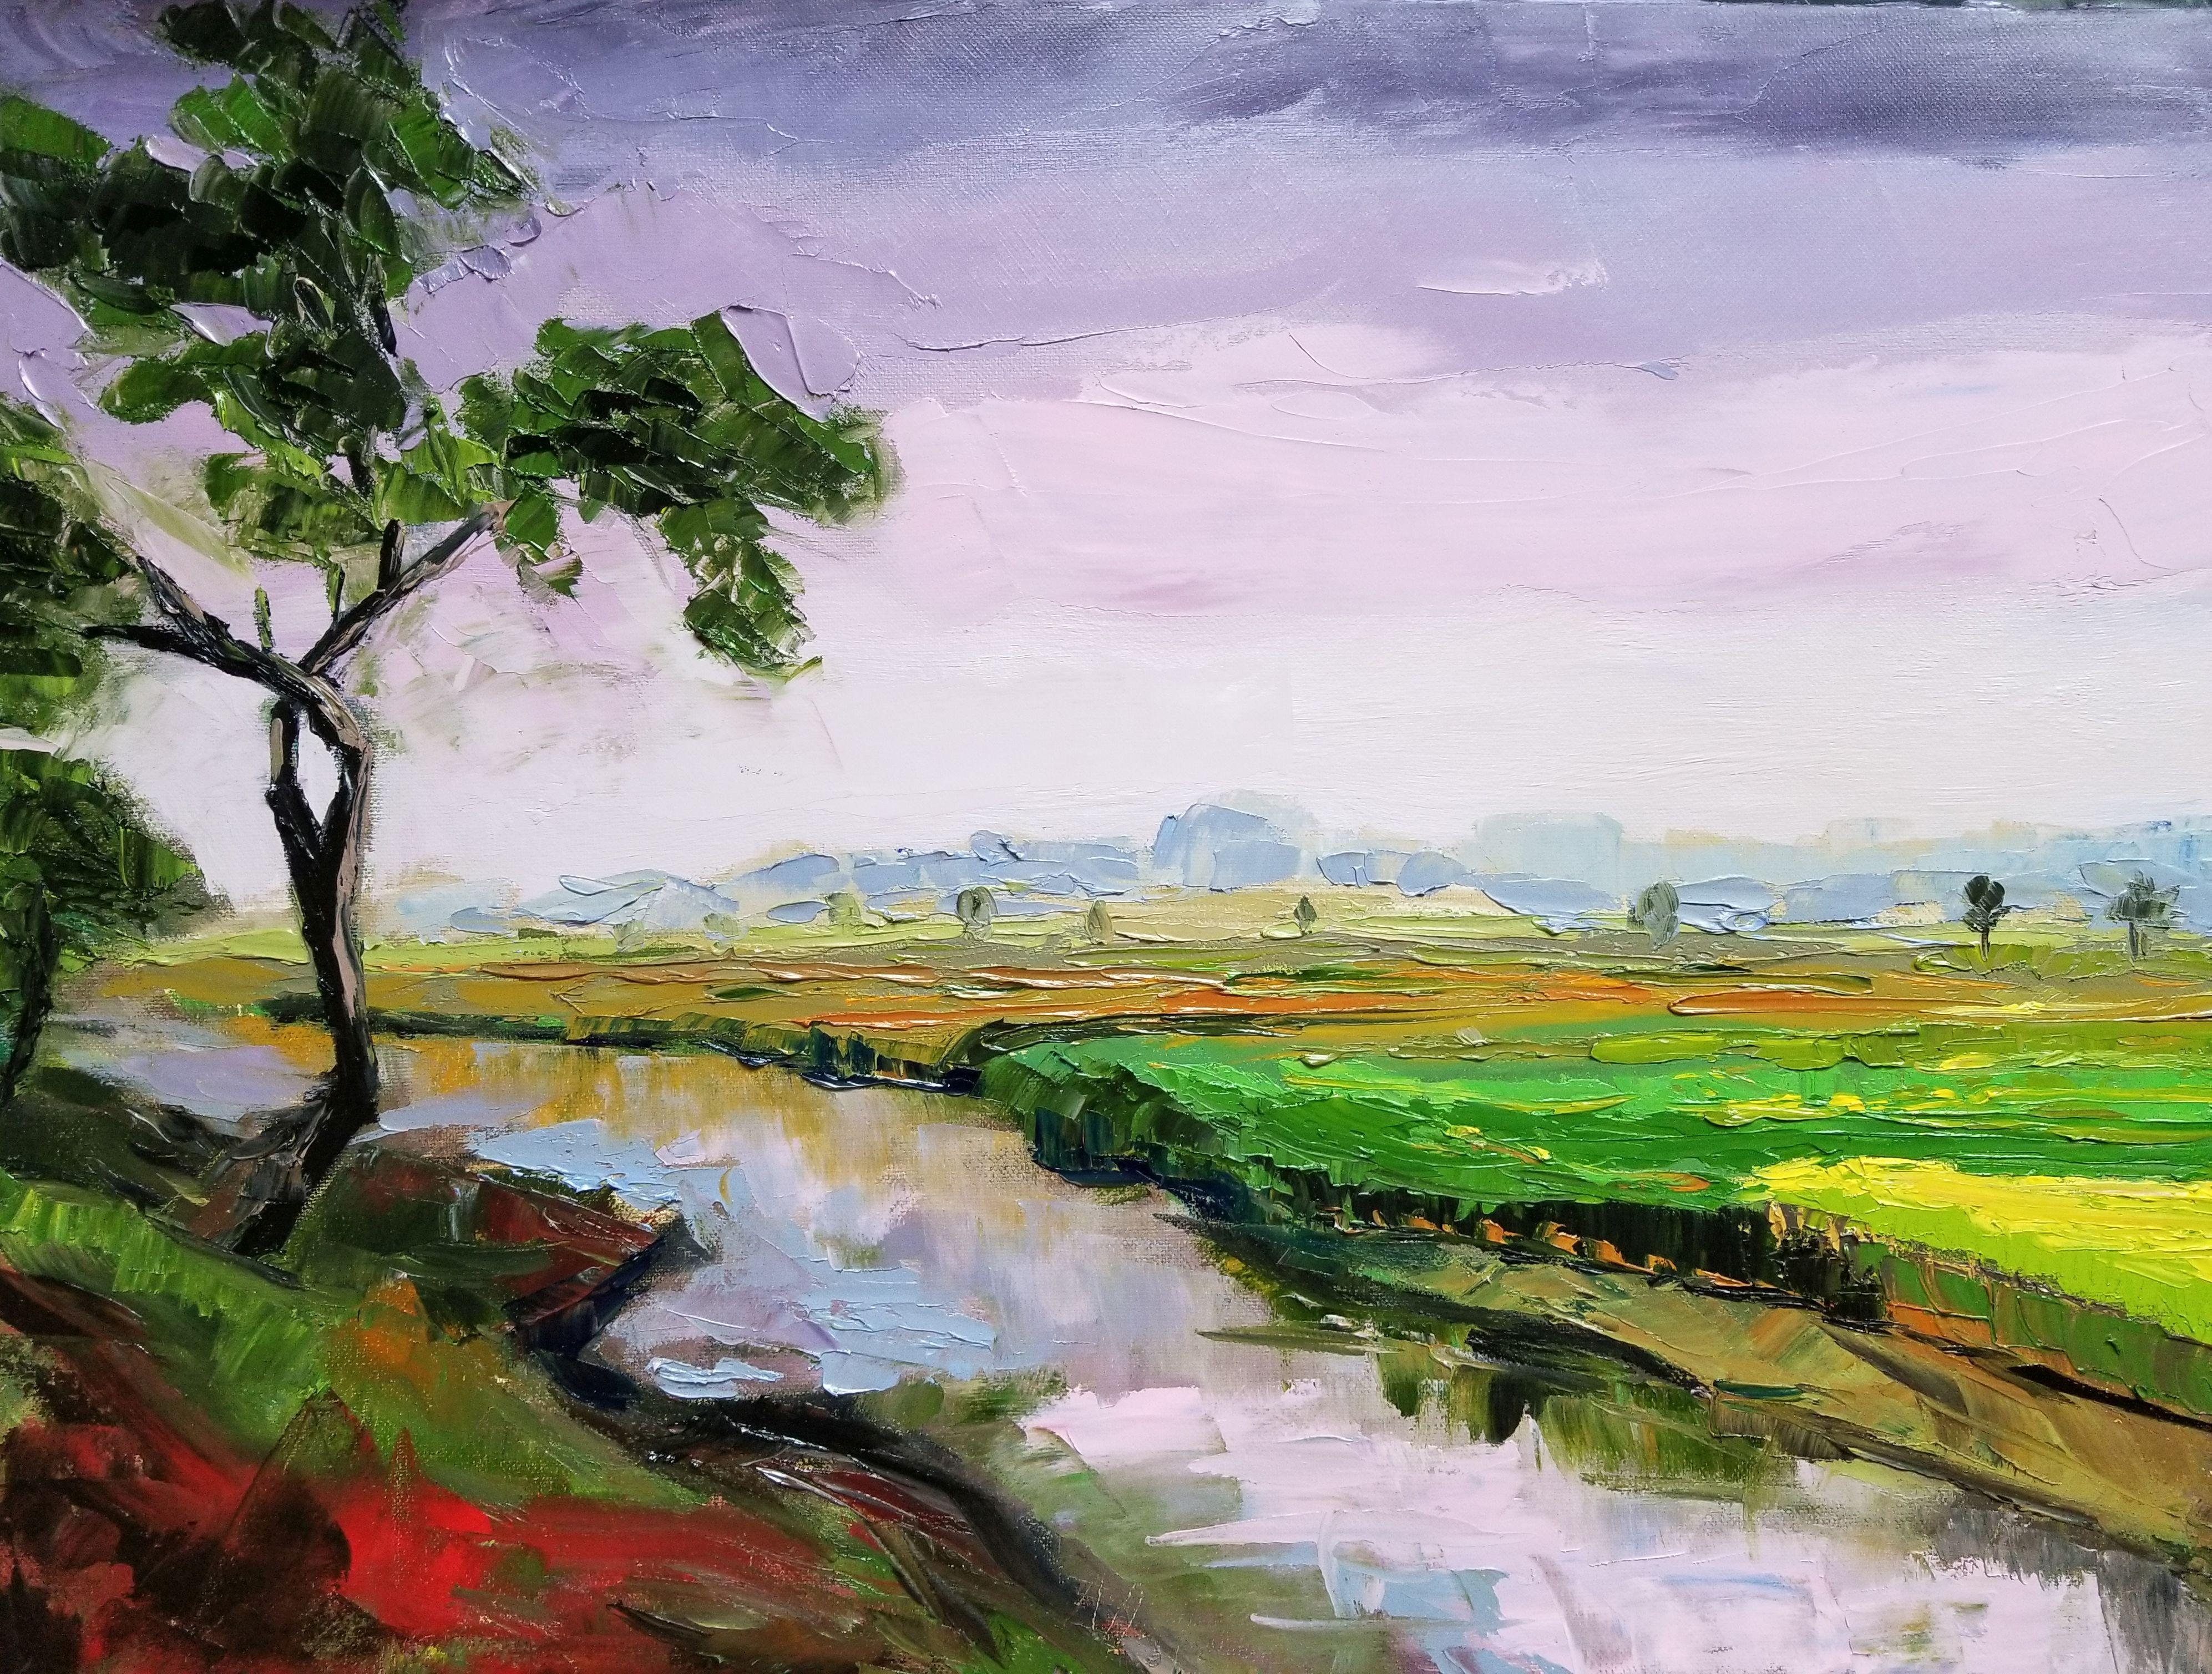 Rivulet by the fields 18x24 Oil on canva